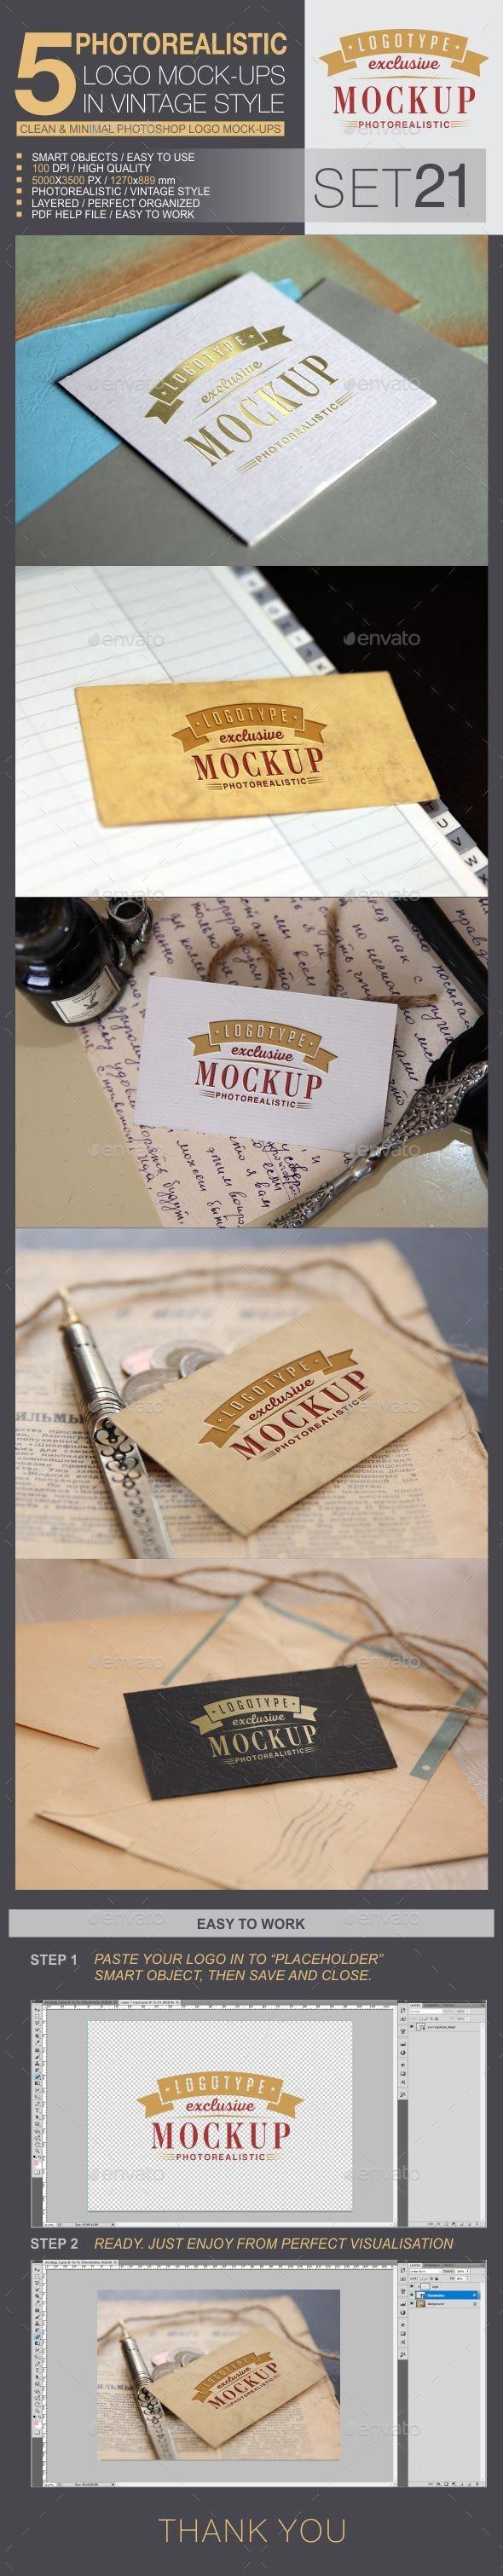 5 Logo Mock-Ups In Vintage Style - Set 21 - Logo Product Mock-Ups